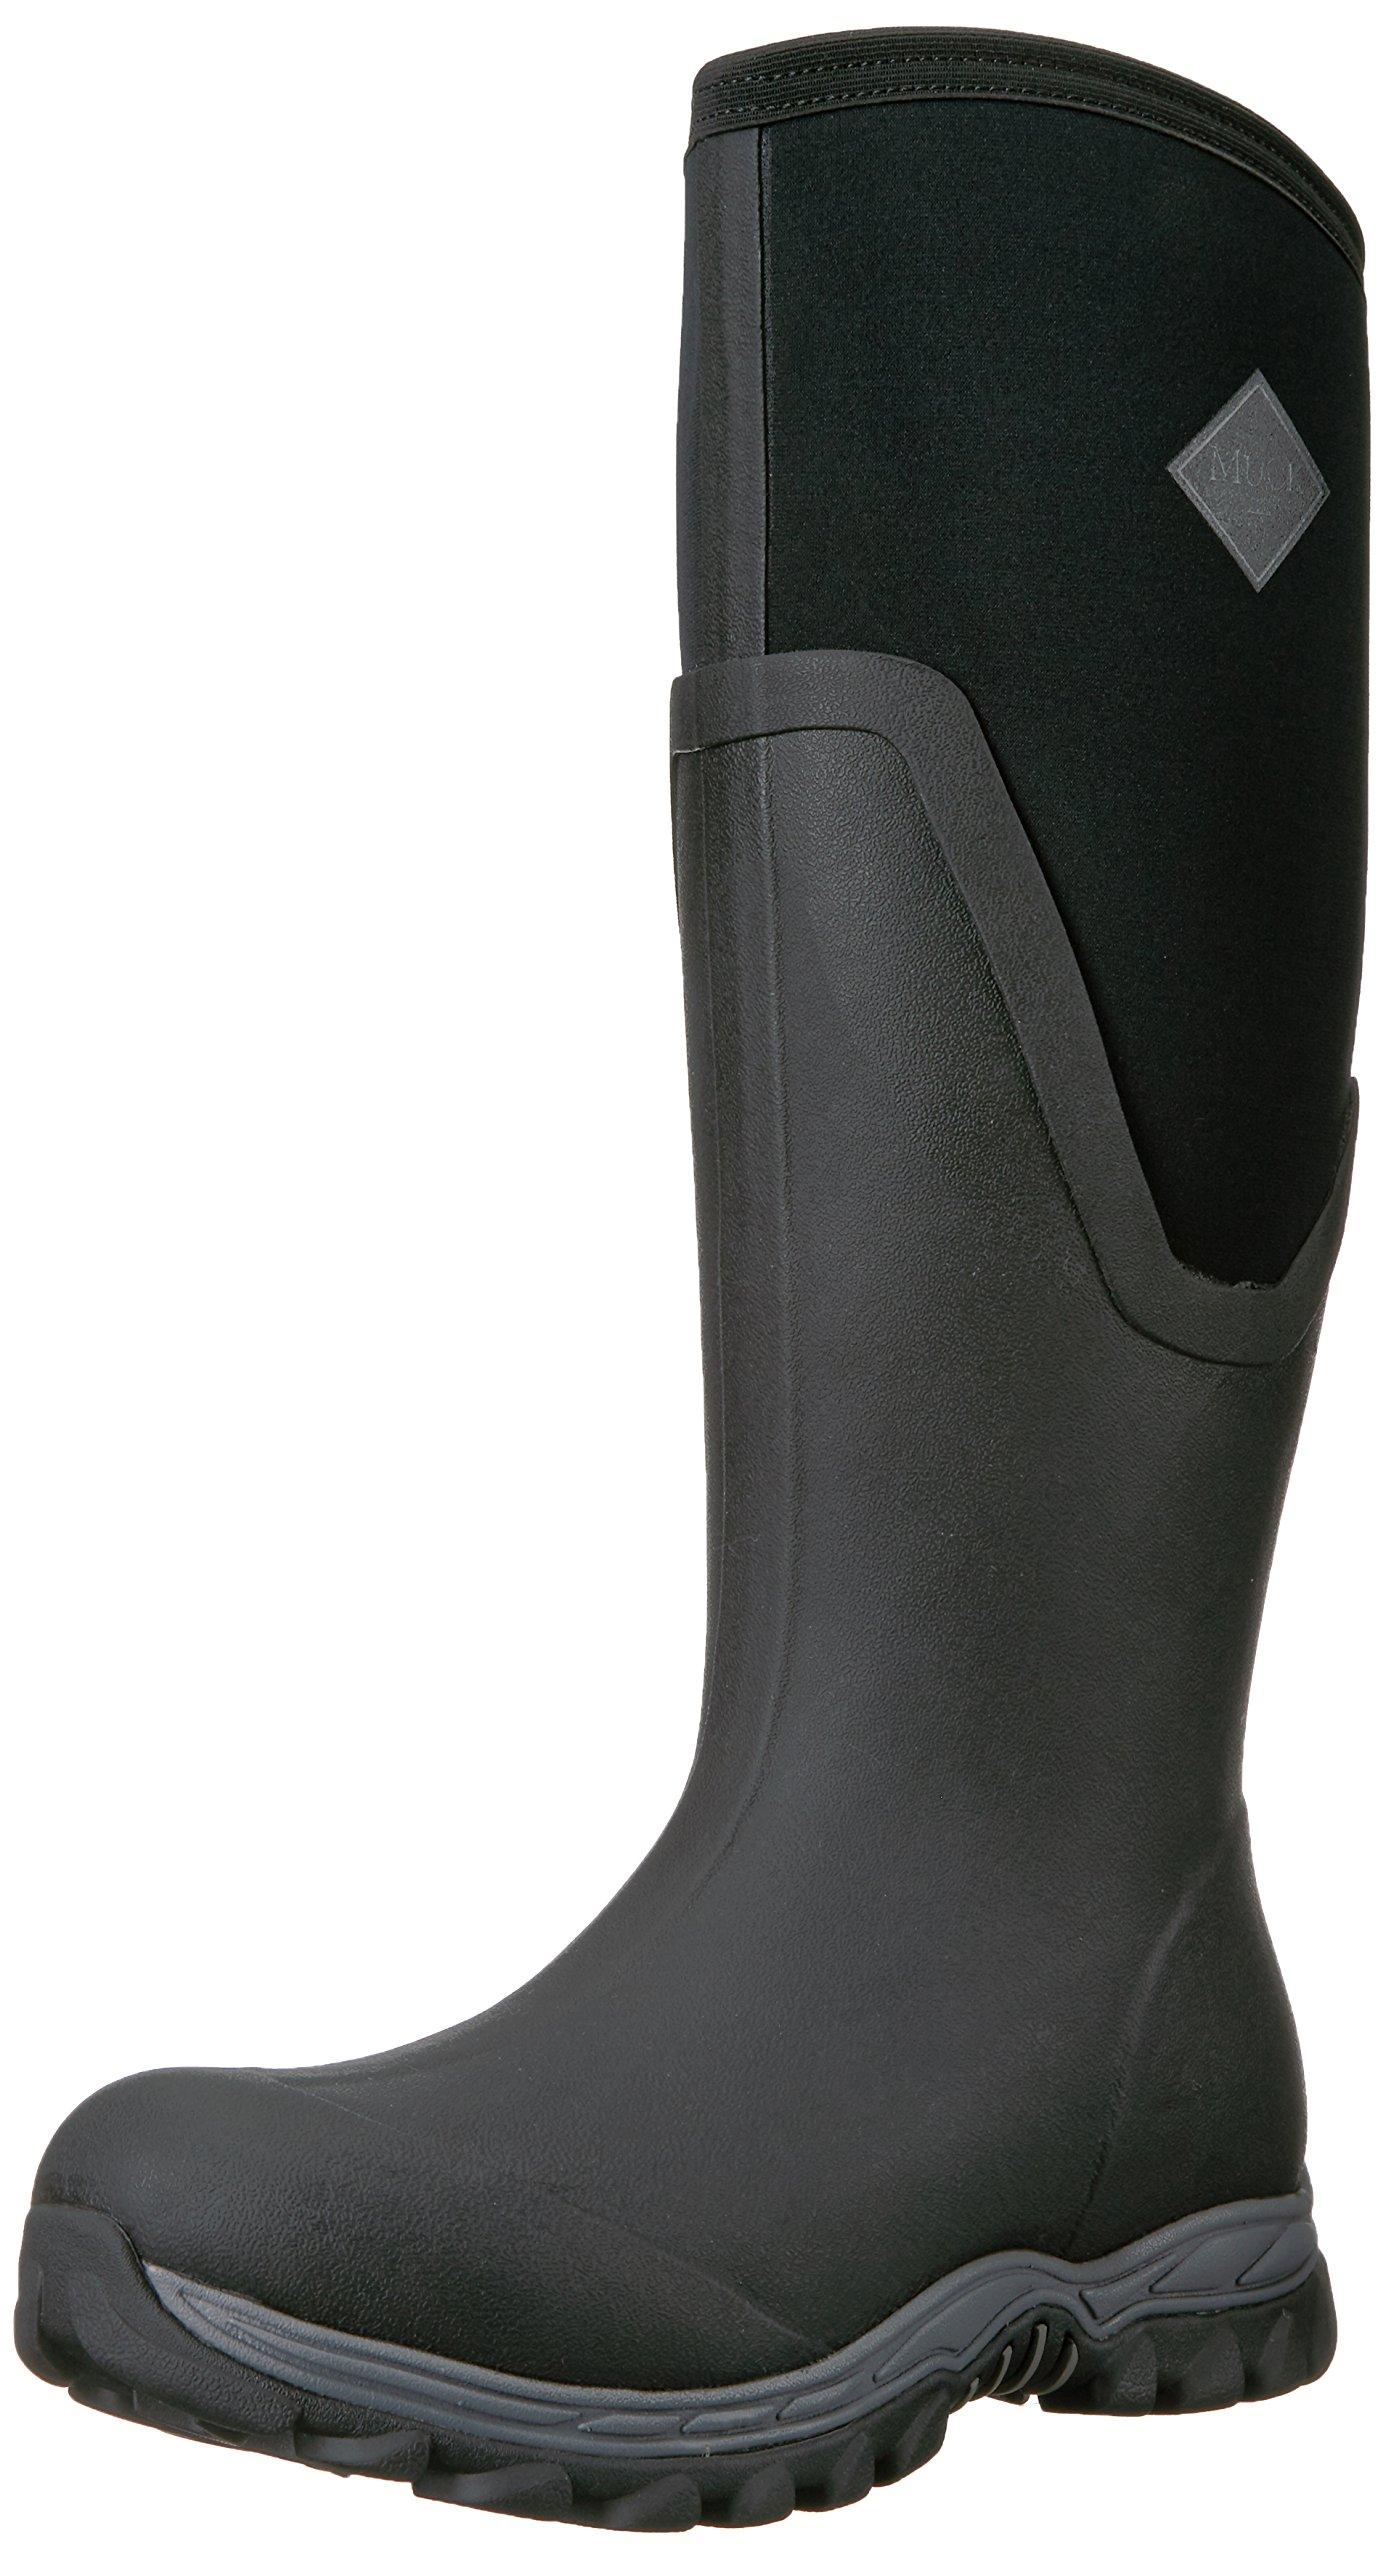 Pluie TallBottesamp; Bottines Muck De FemmeNoir Eu Black42 Sport Arctic Ii Boots OTiPZukX